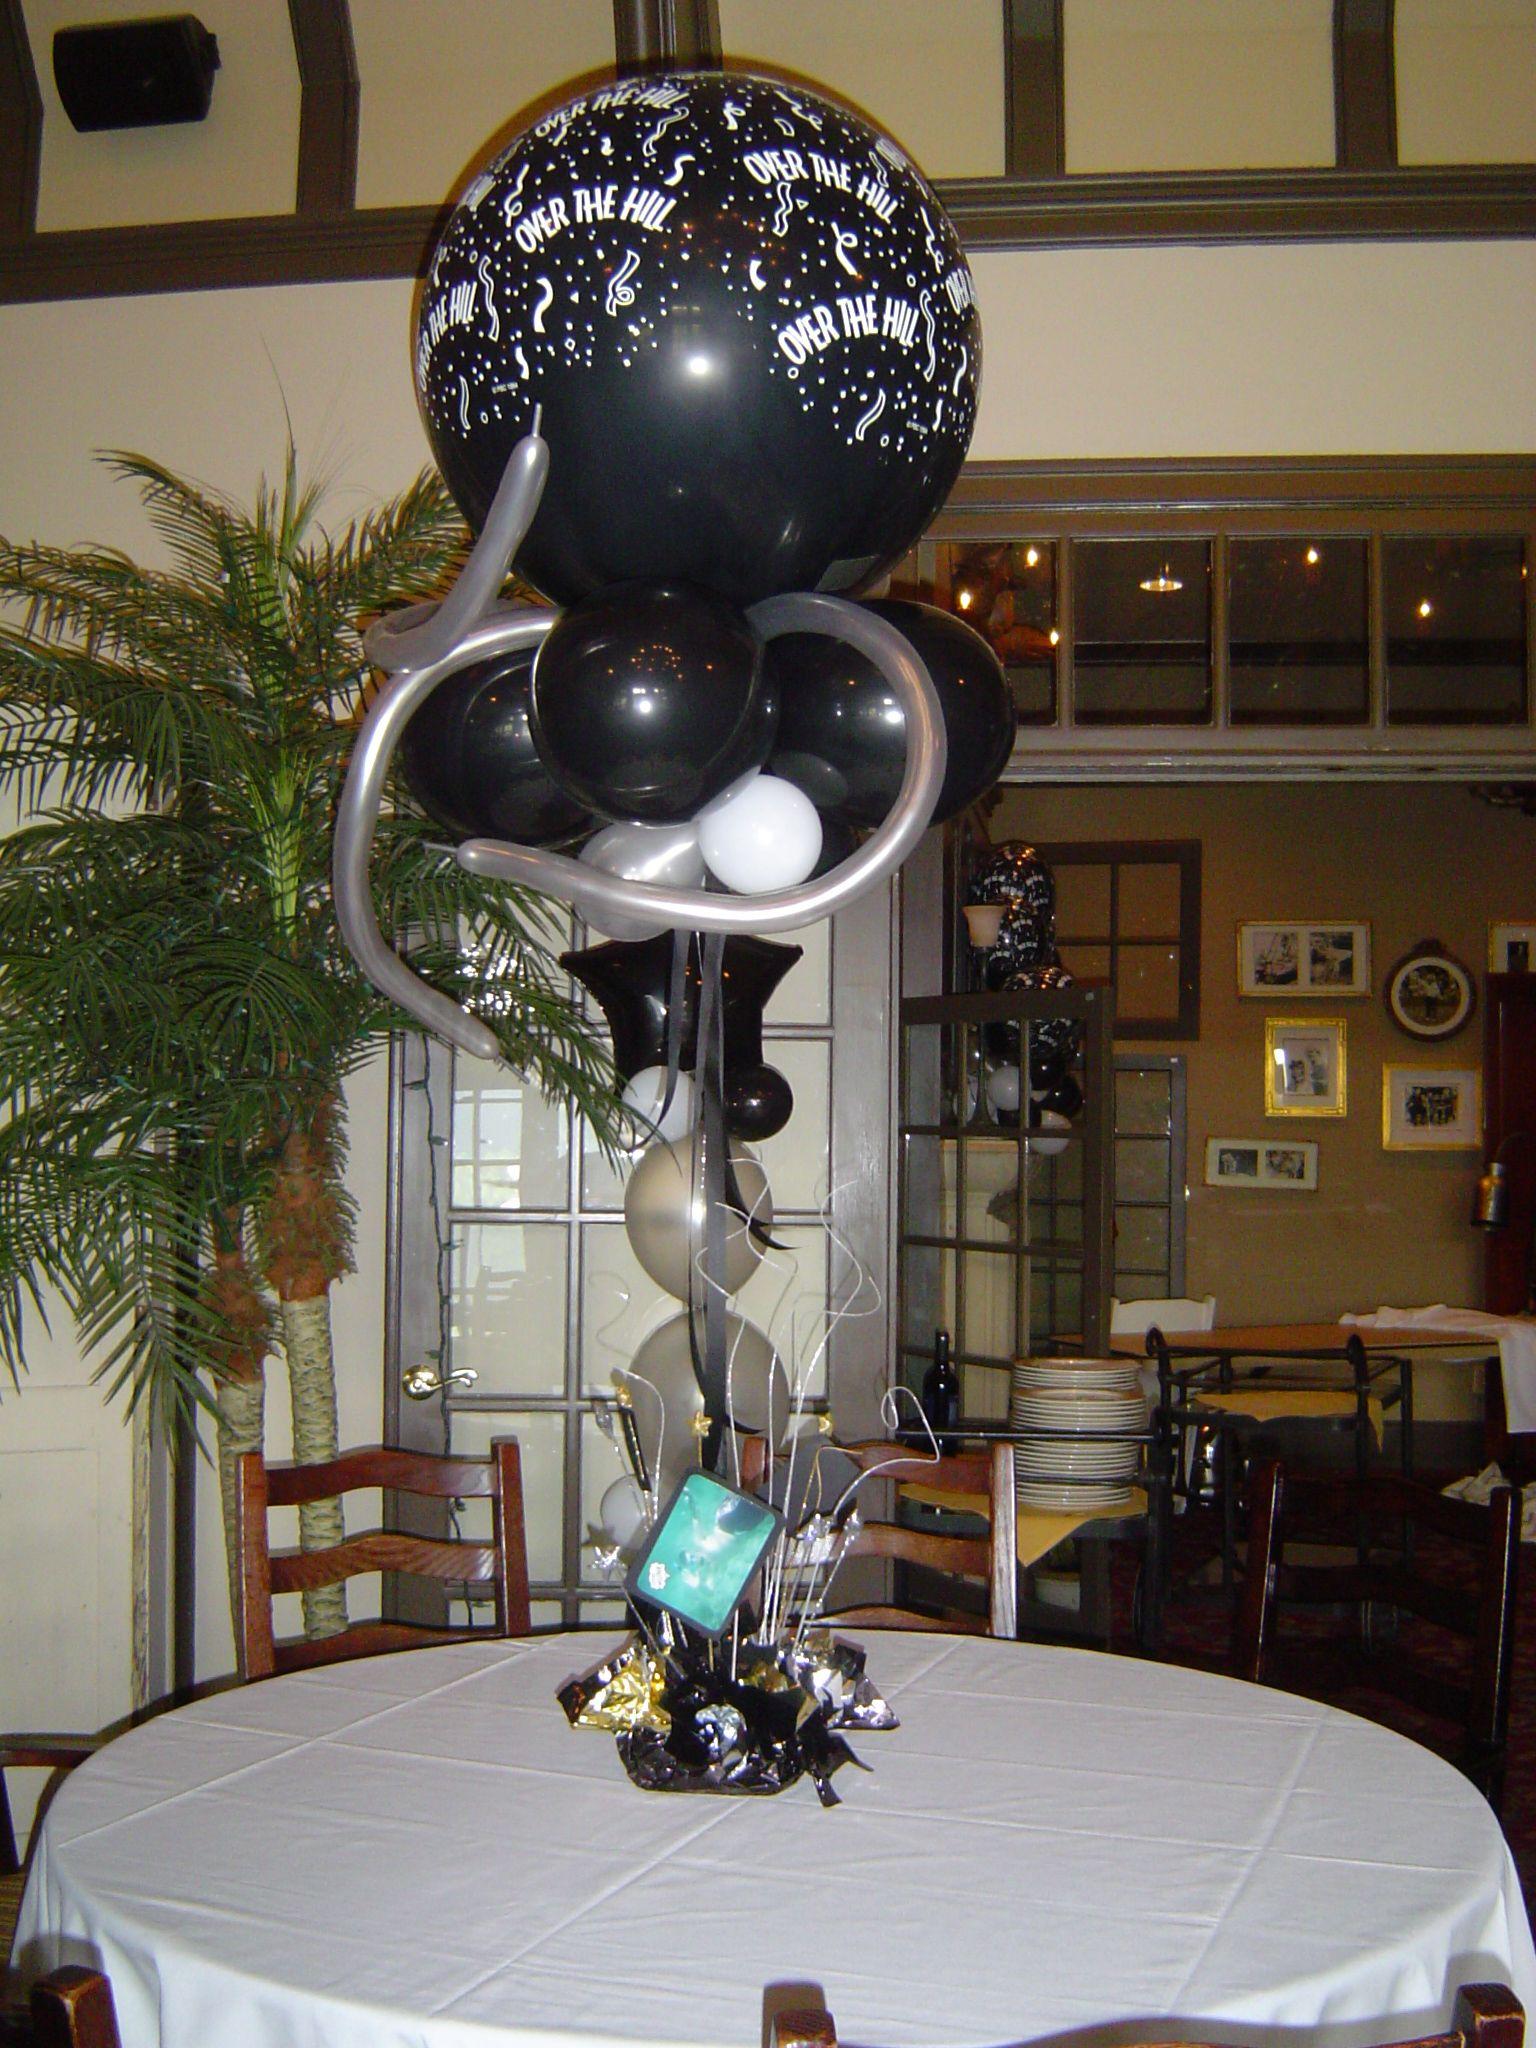 40th Birthday Decorations Birthday Decor Gallery 40th Birthday Balloon 40th Birthday Table Decorations 40th Birthday Centerpieces 40th Birthday Decorations